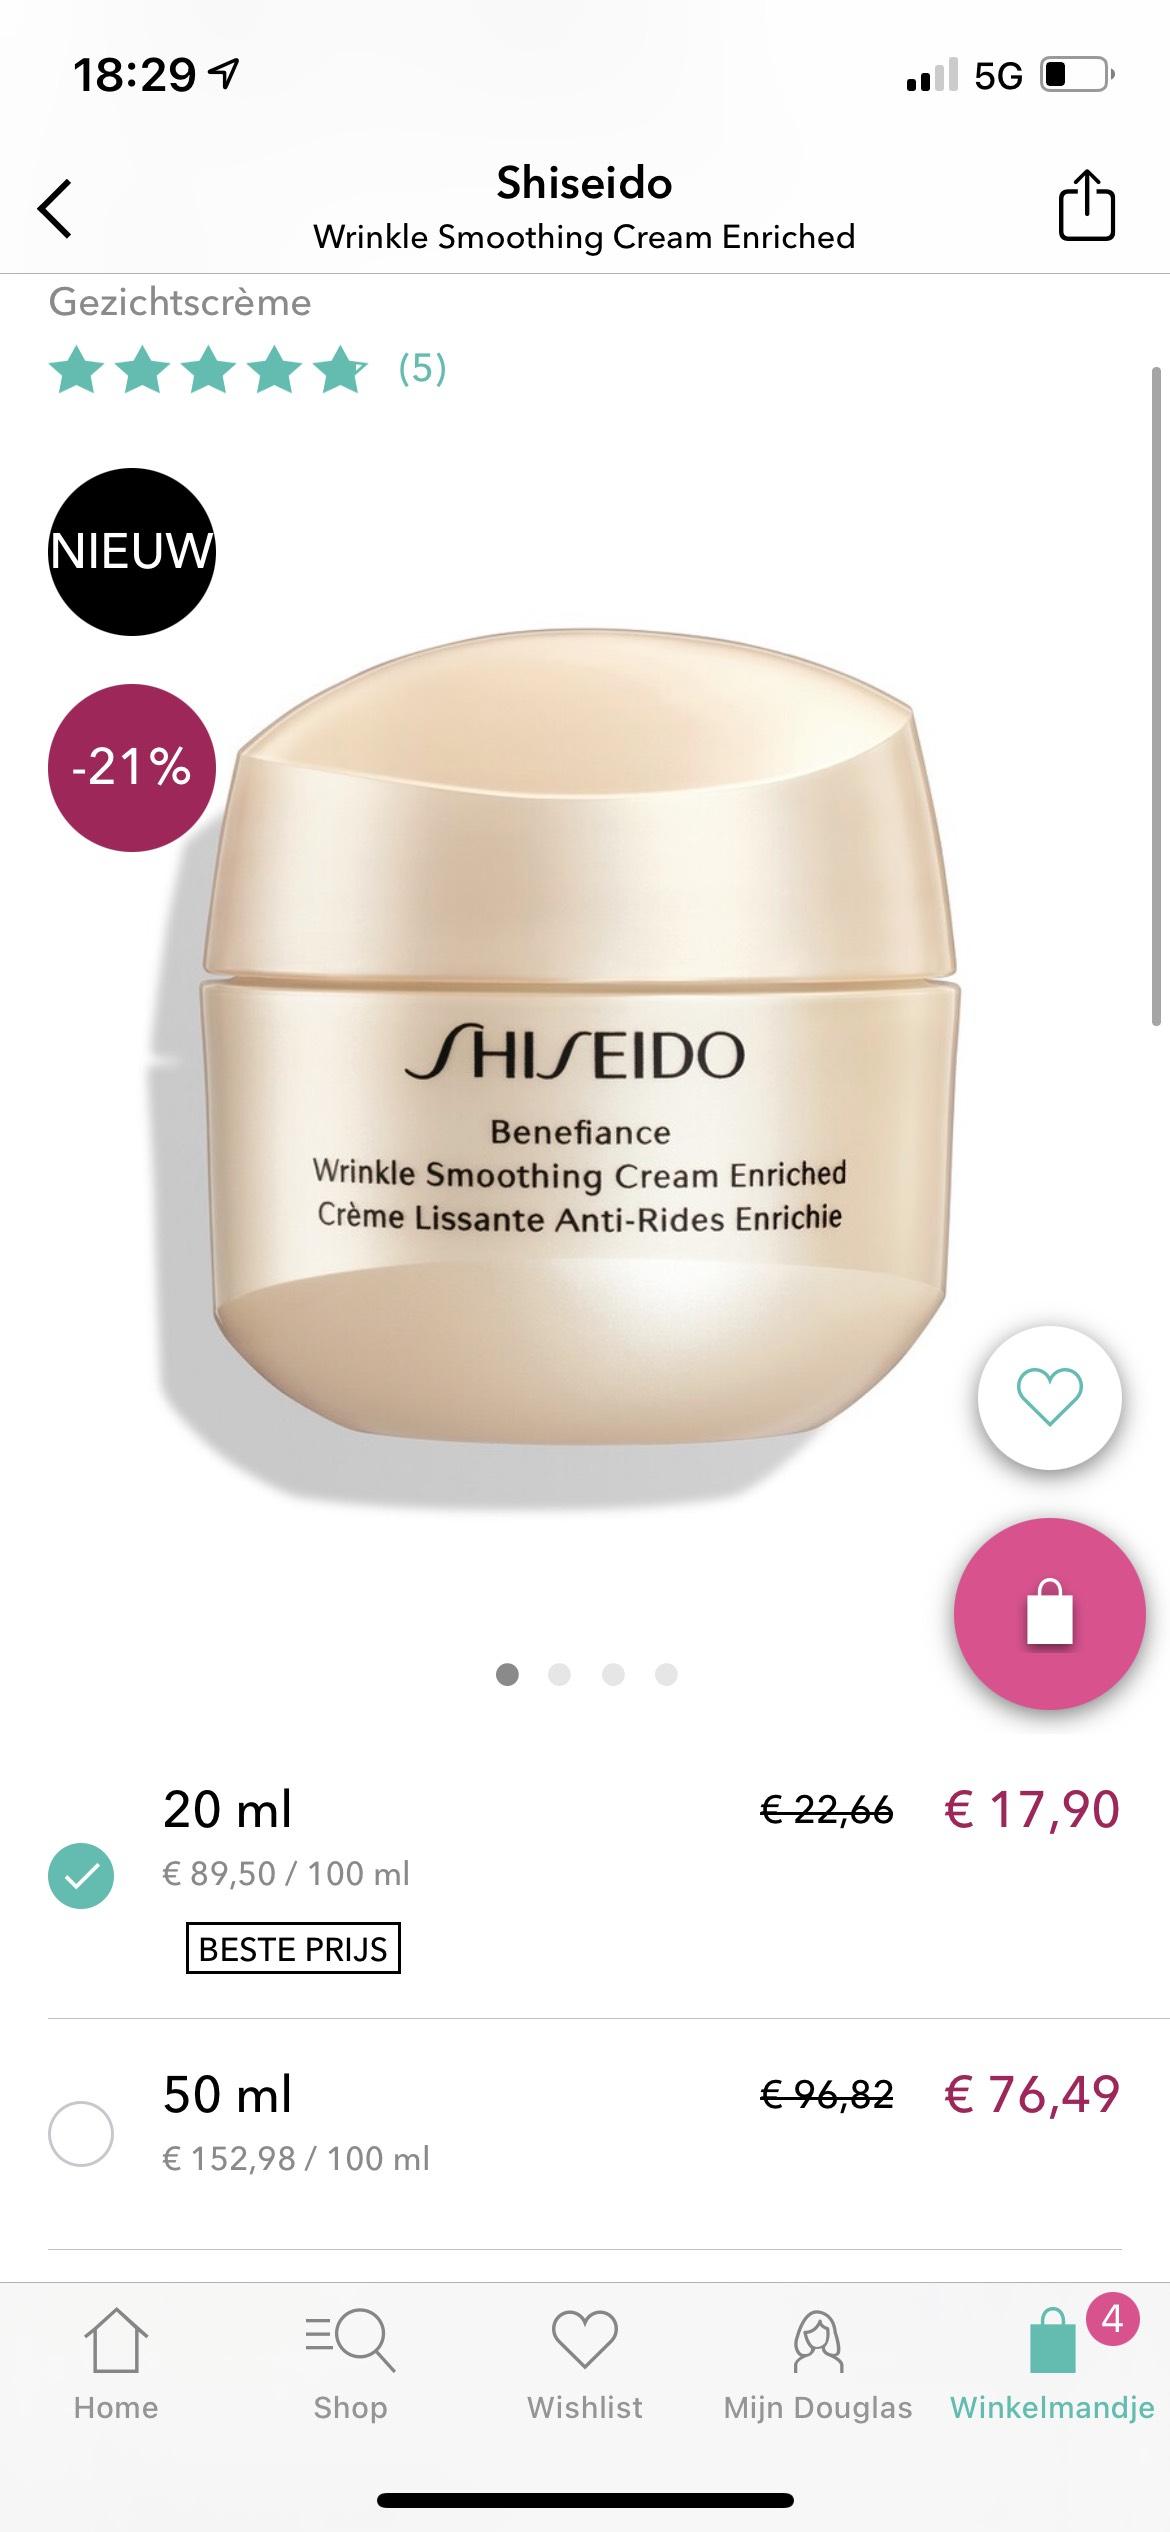 Aanbieding dure Shiseido dag creme 20ml